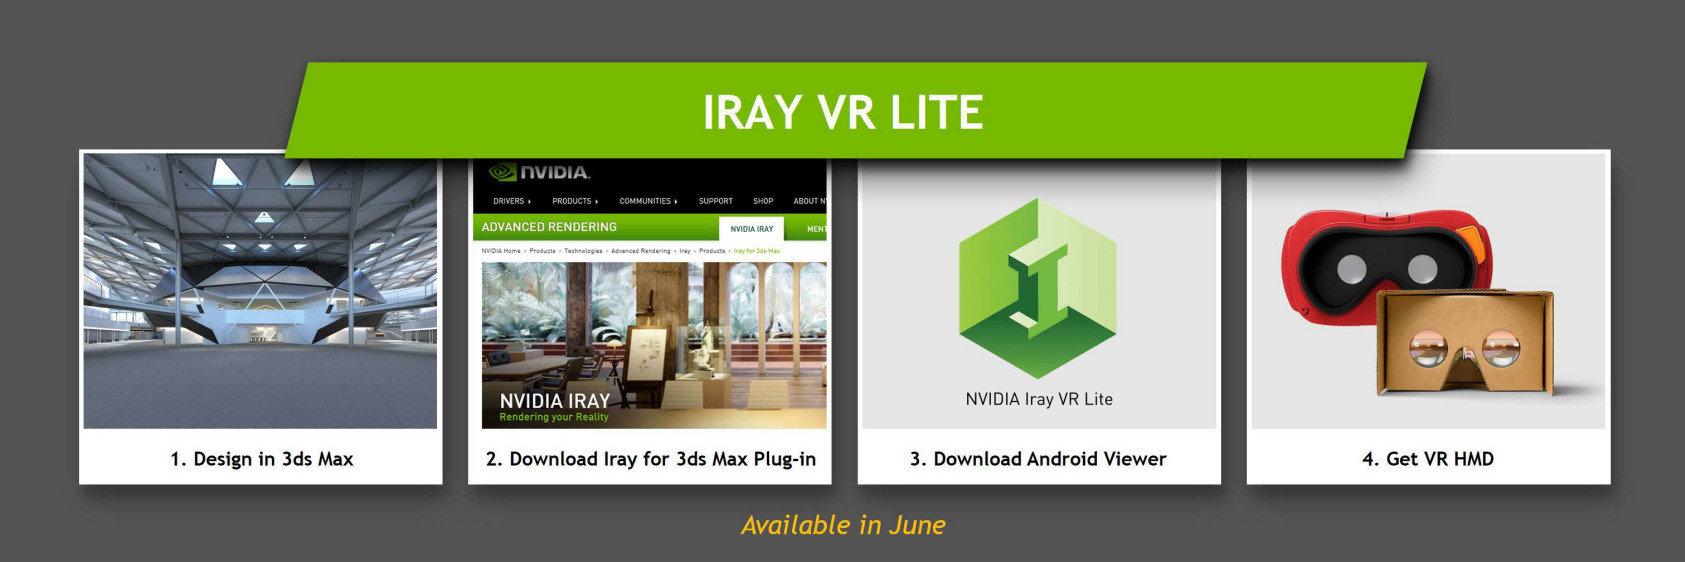 Iray VR